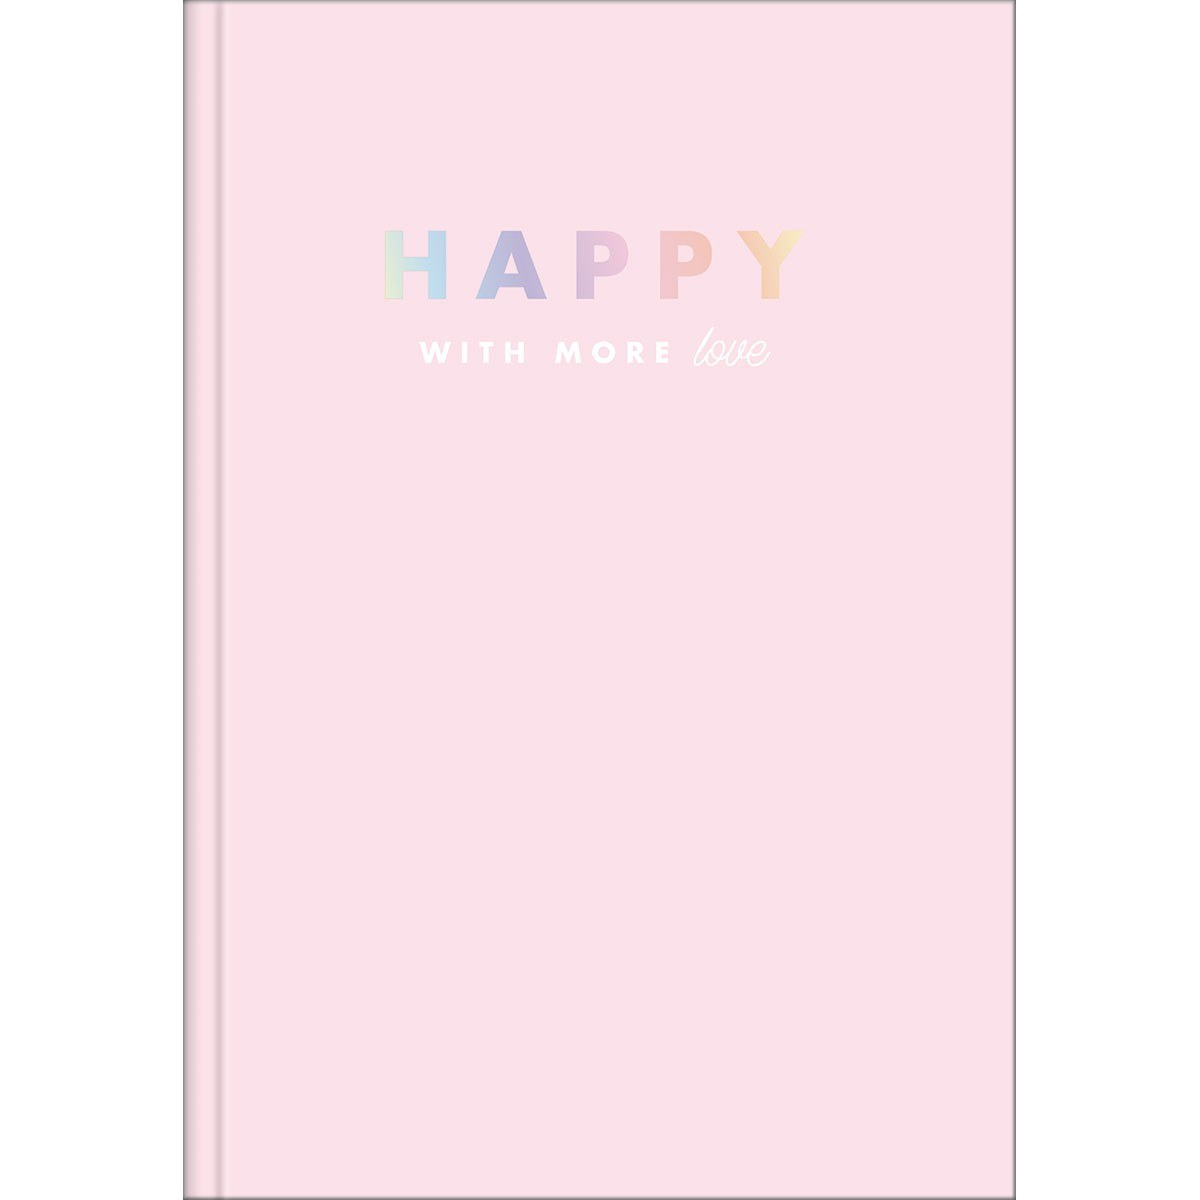 Caderno Brochura Capa Dura 1/4 Happy 80 Fls - Tilibra